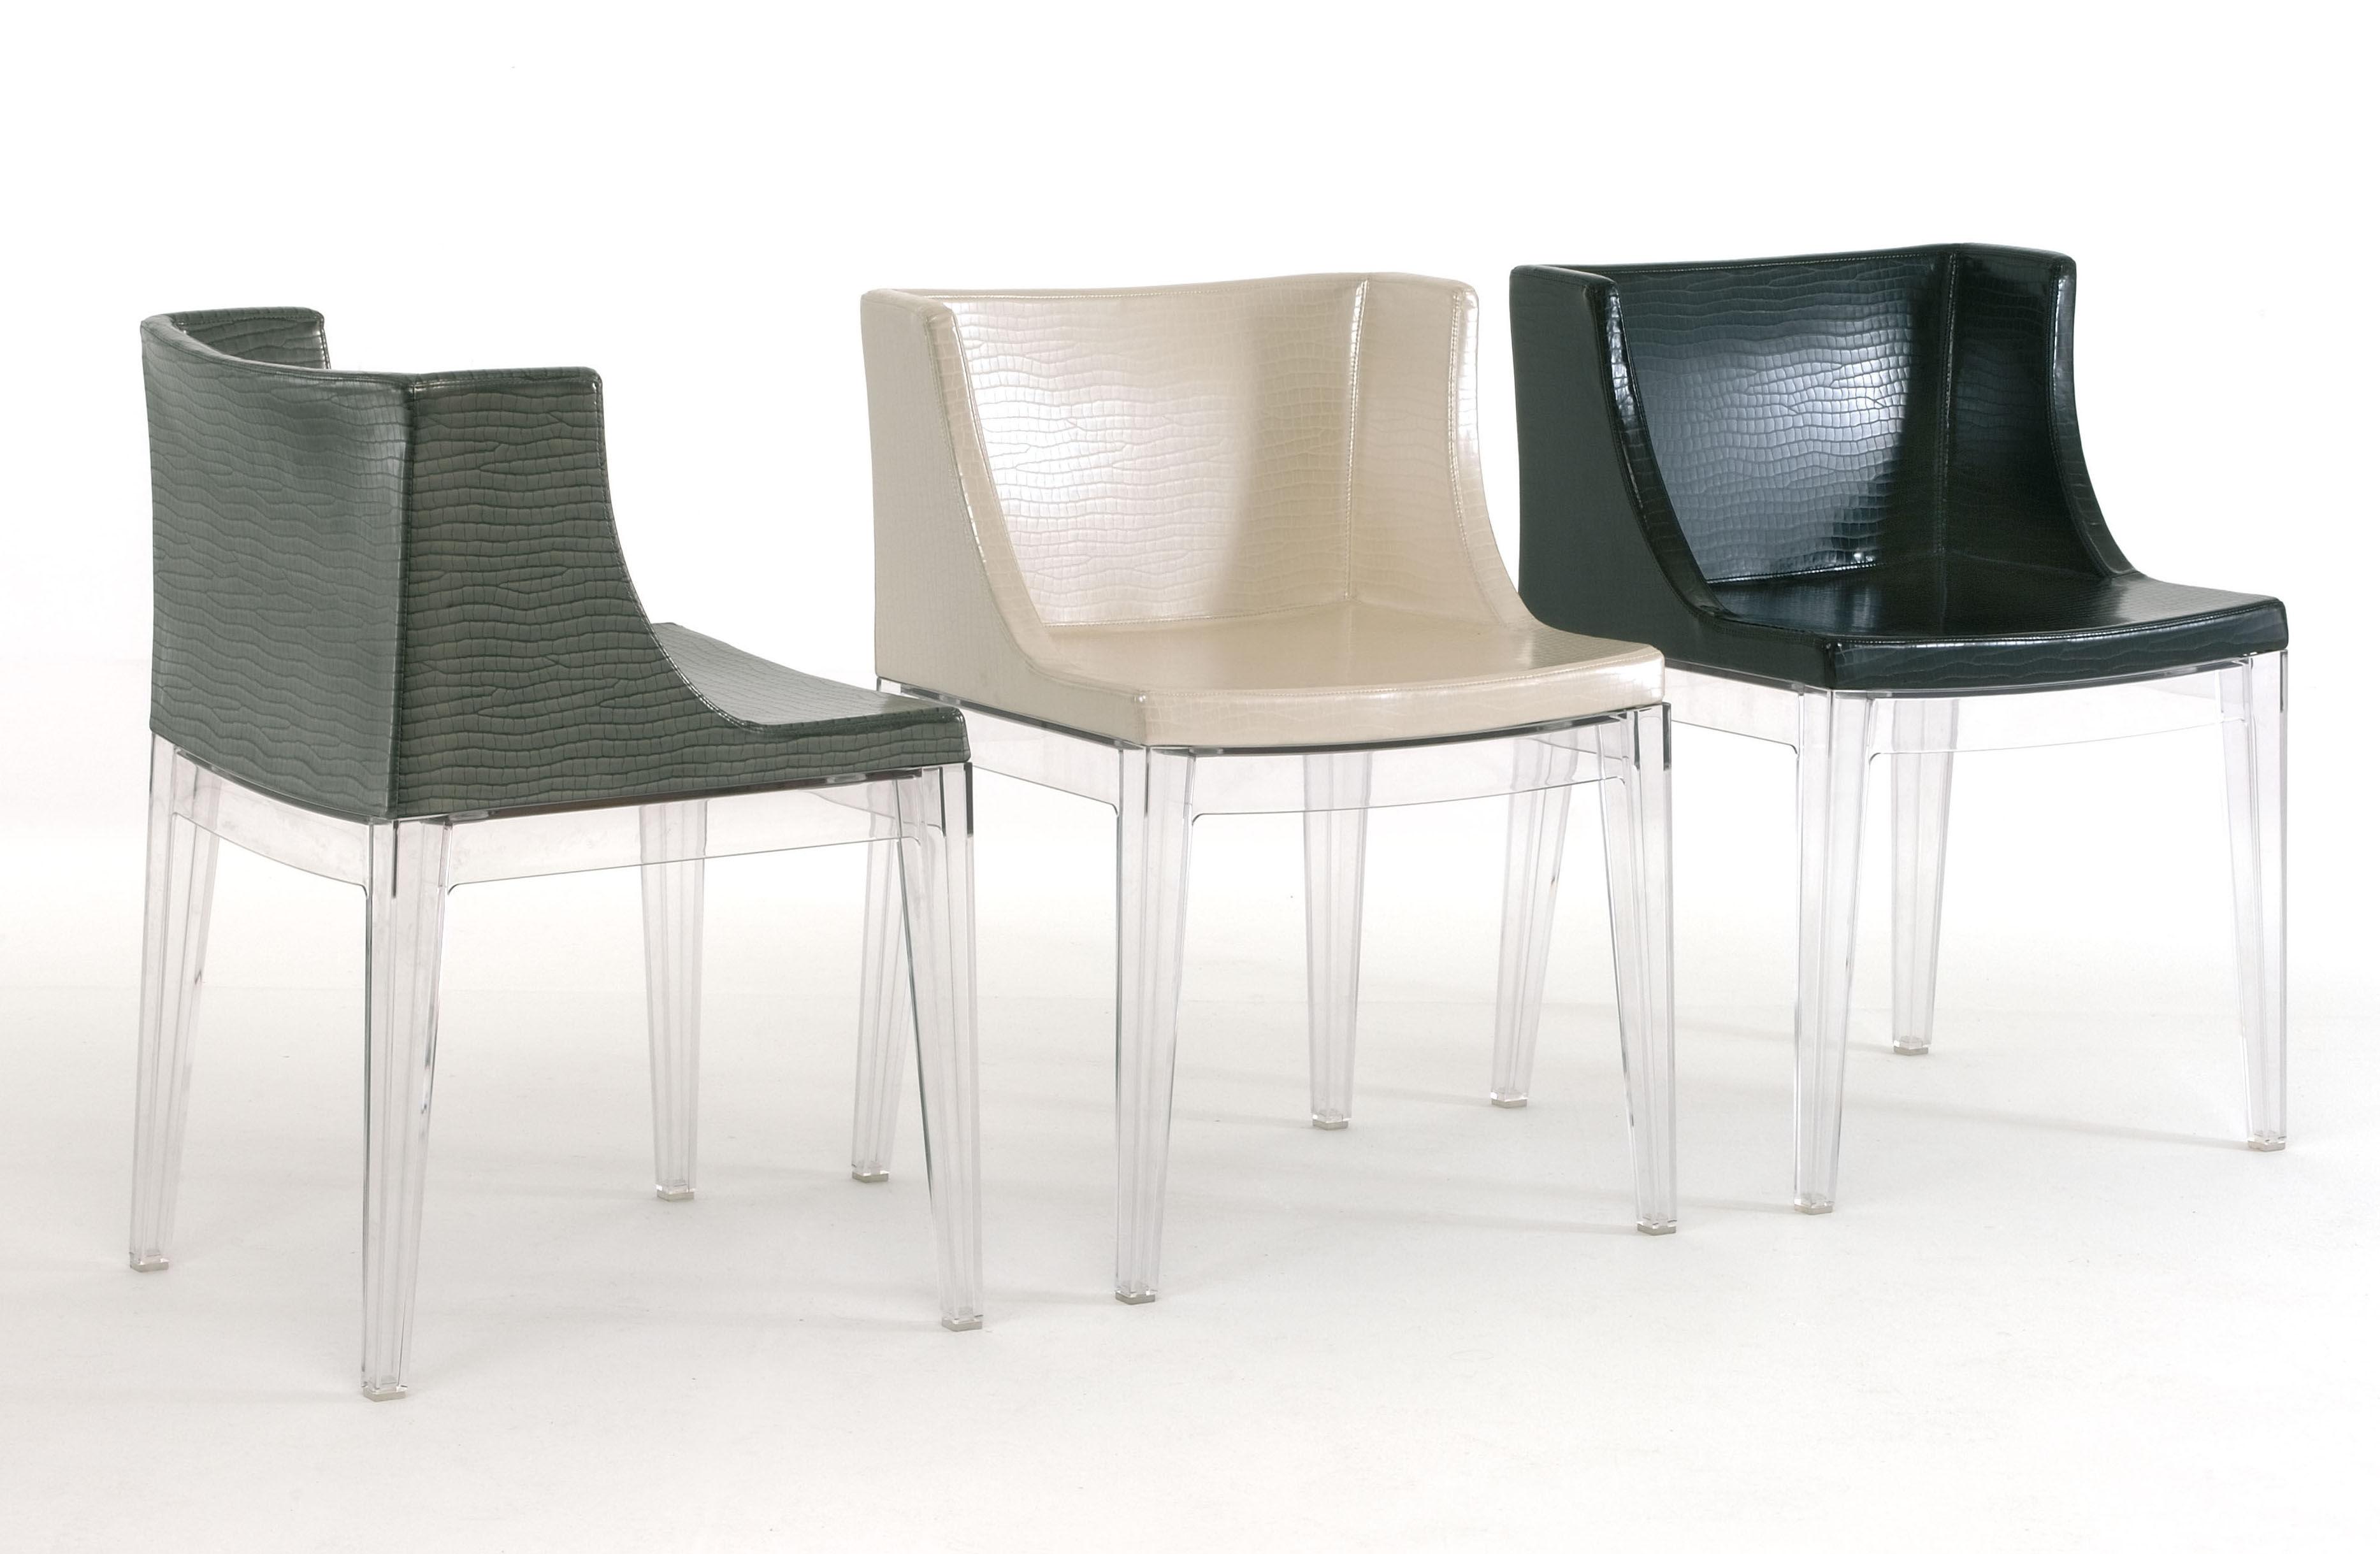 fauteuil rembourr mademoiselle cocco structure transparente kartell. Black Bedroom Furniture Sets. Home Design Ideas